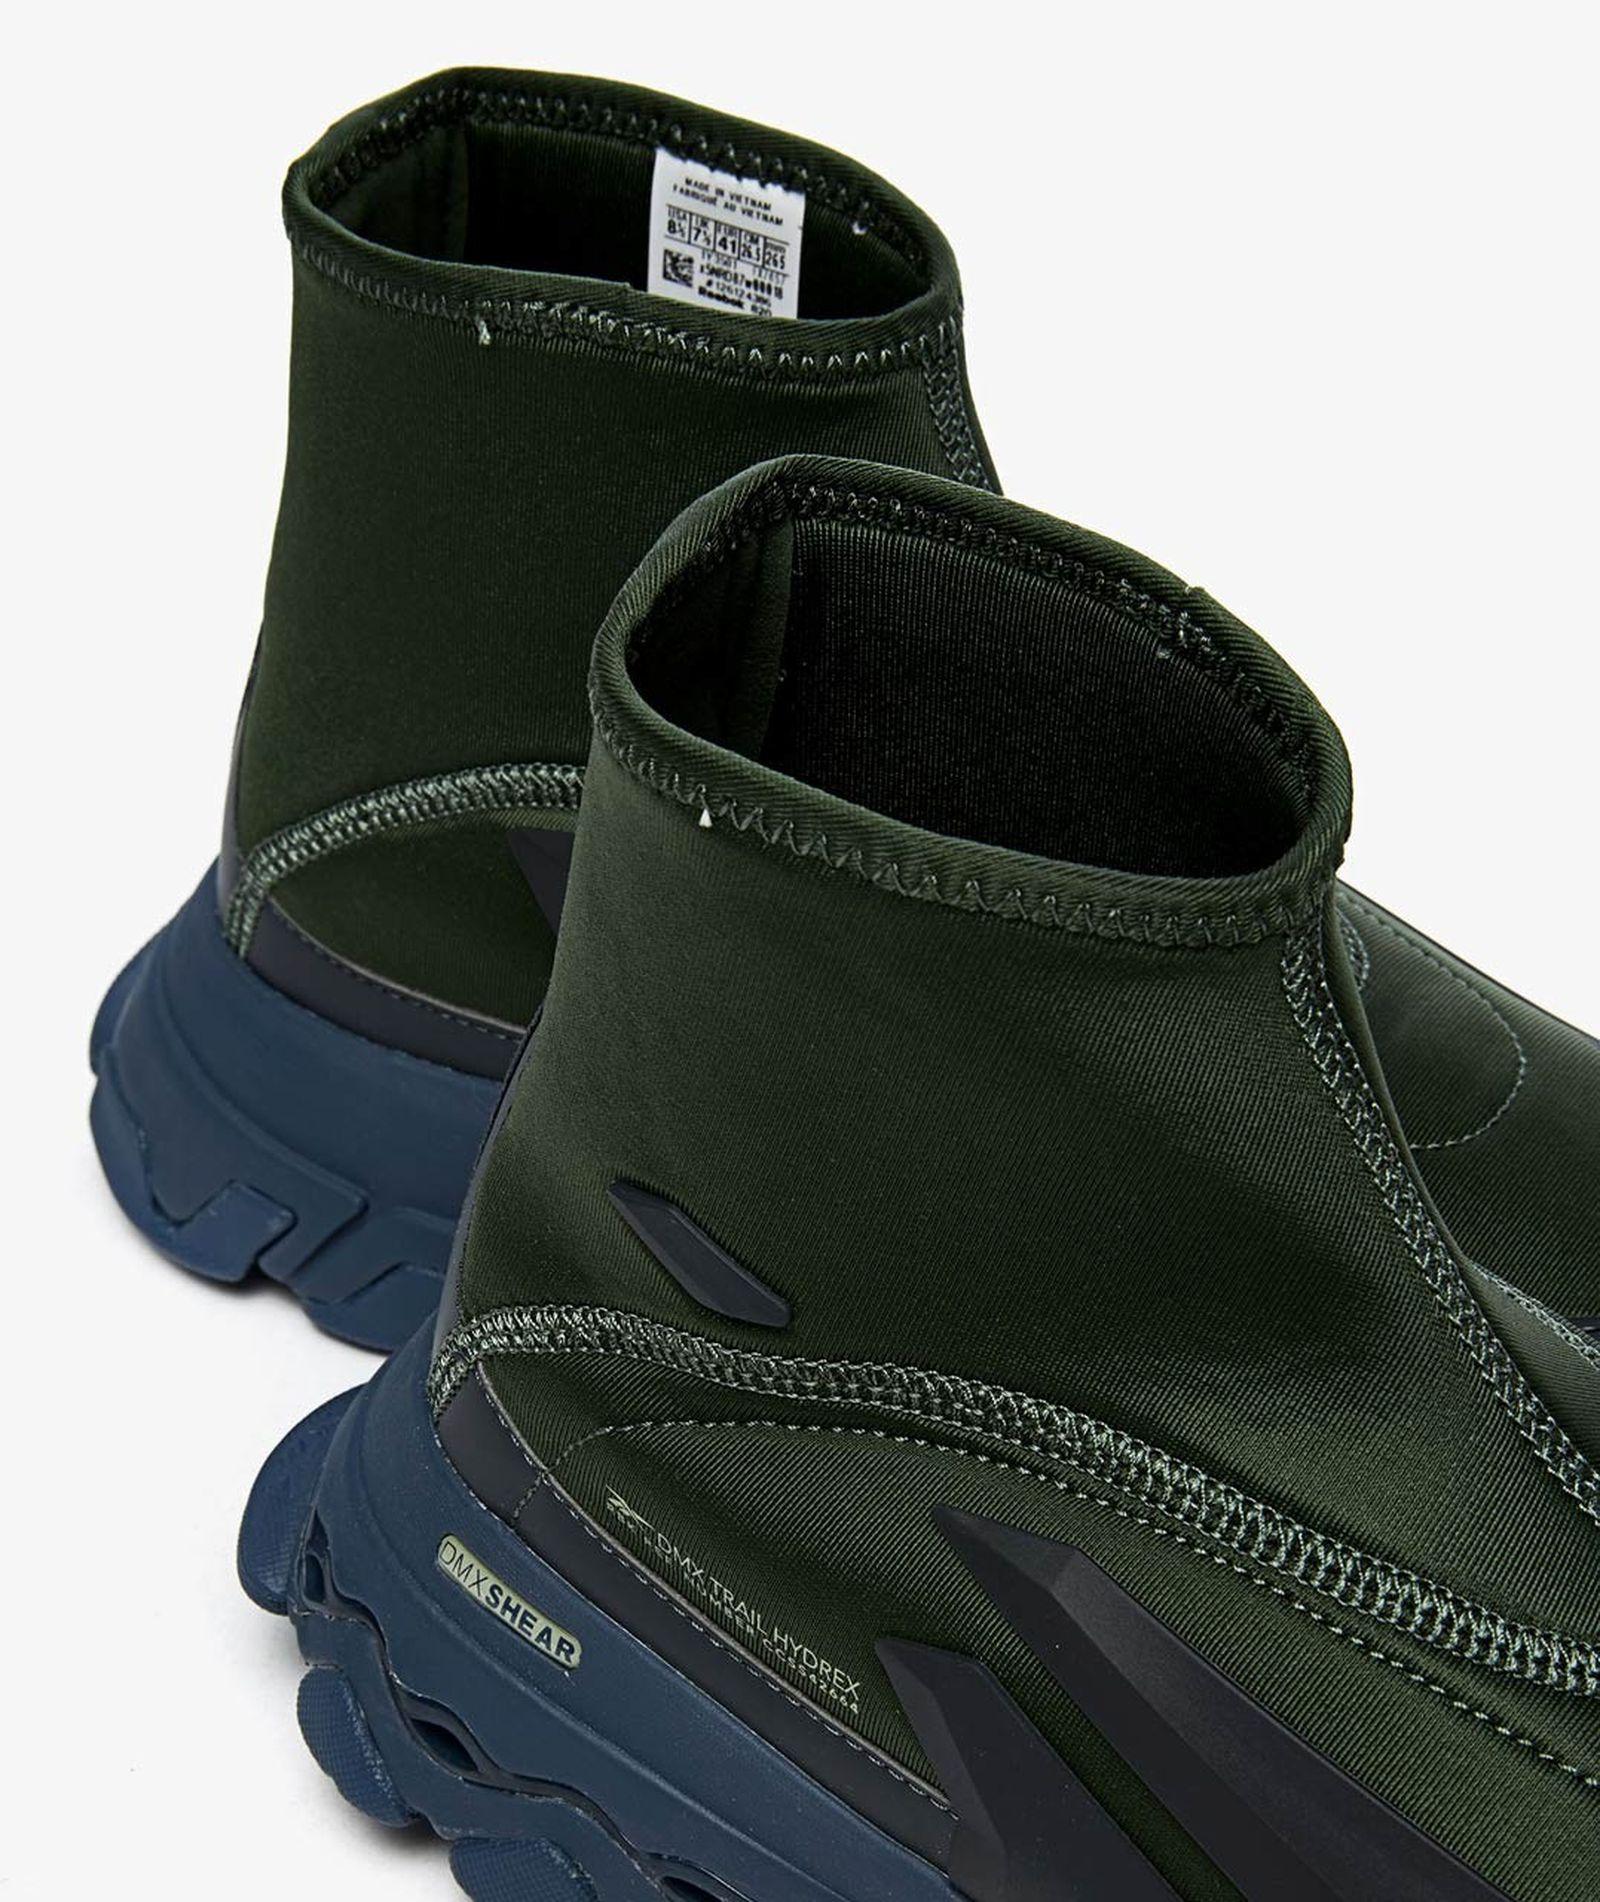 reebok-dmx-trail-hydrex-primal-green-release-date-price-01